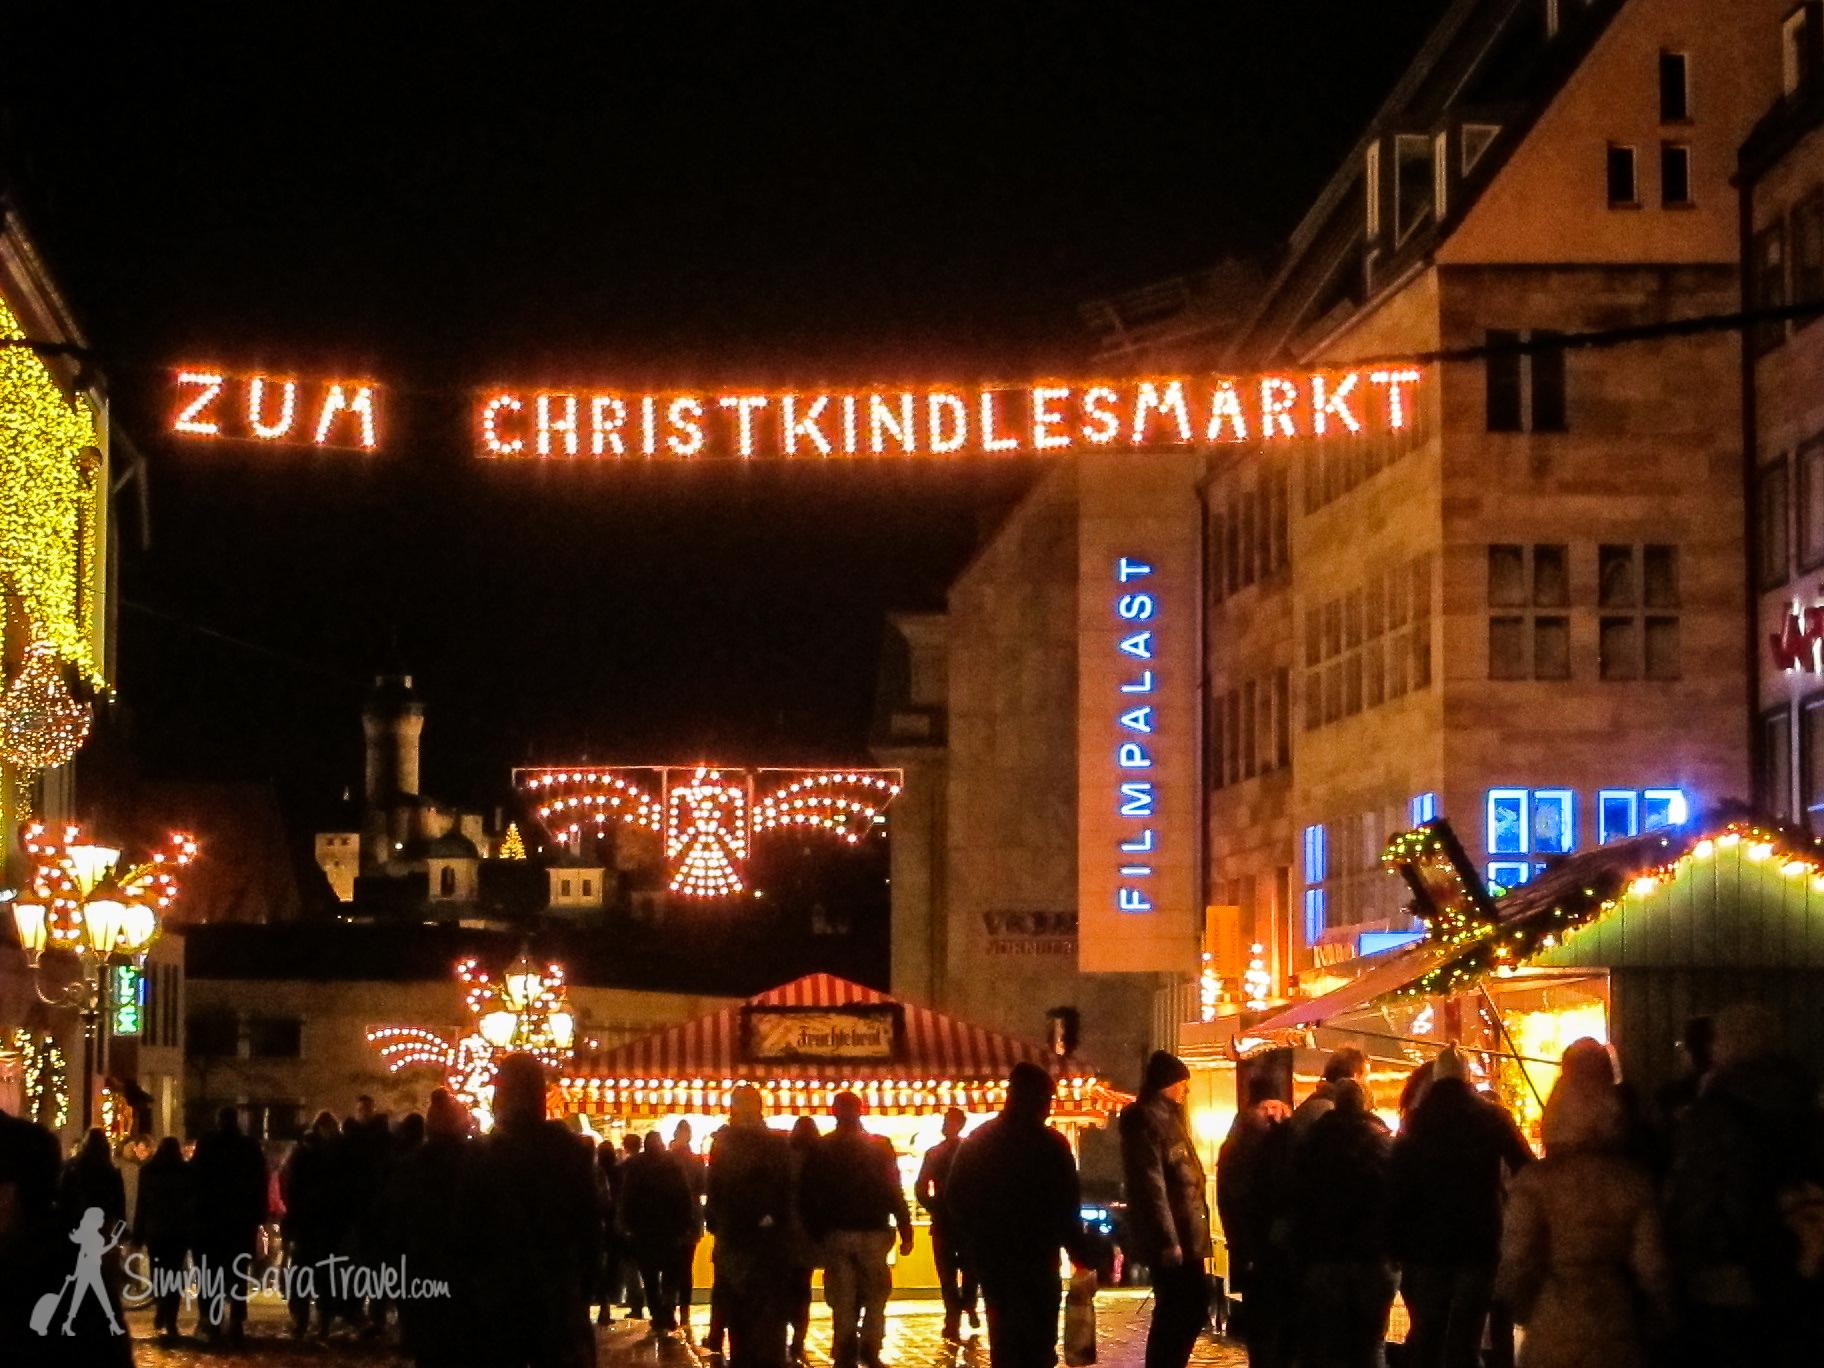 """To the Christmas market"" sign inNürnberg"